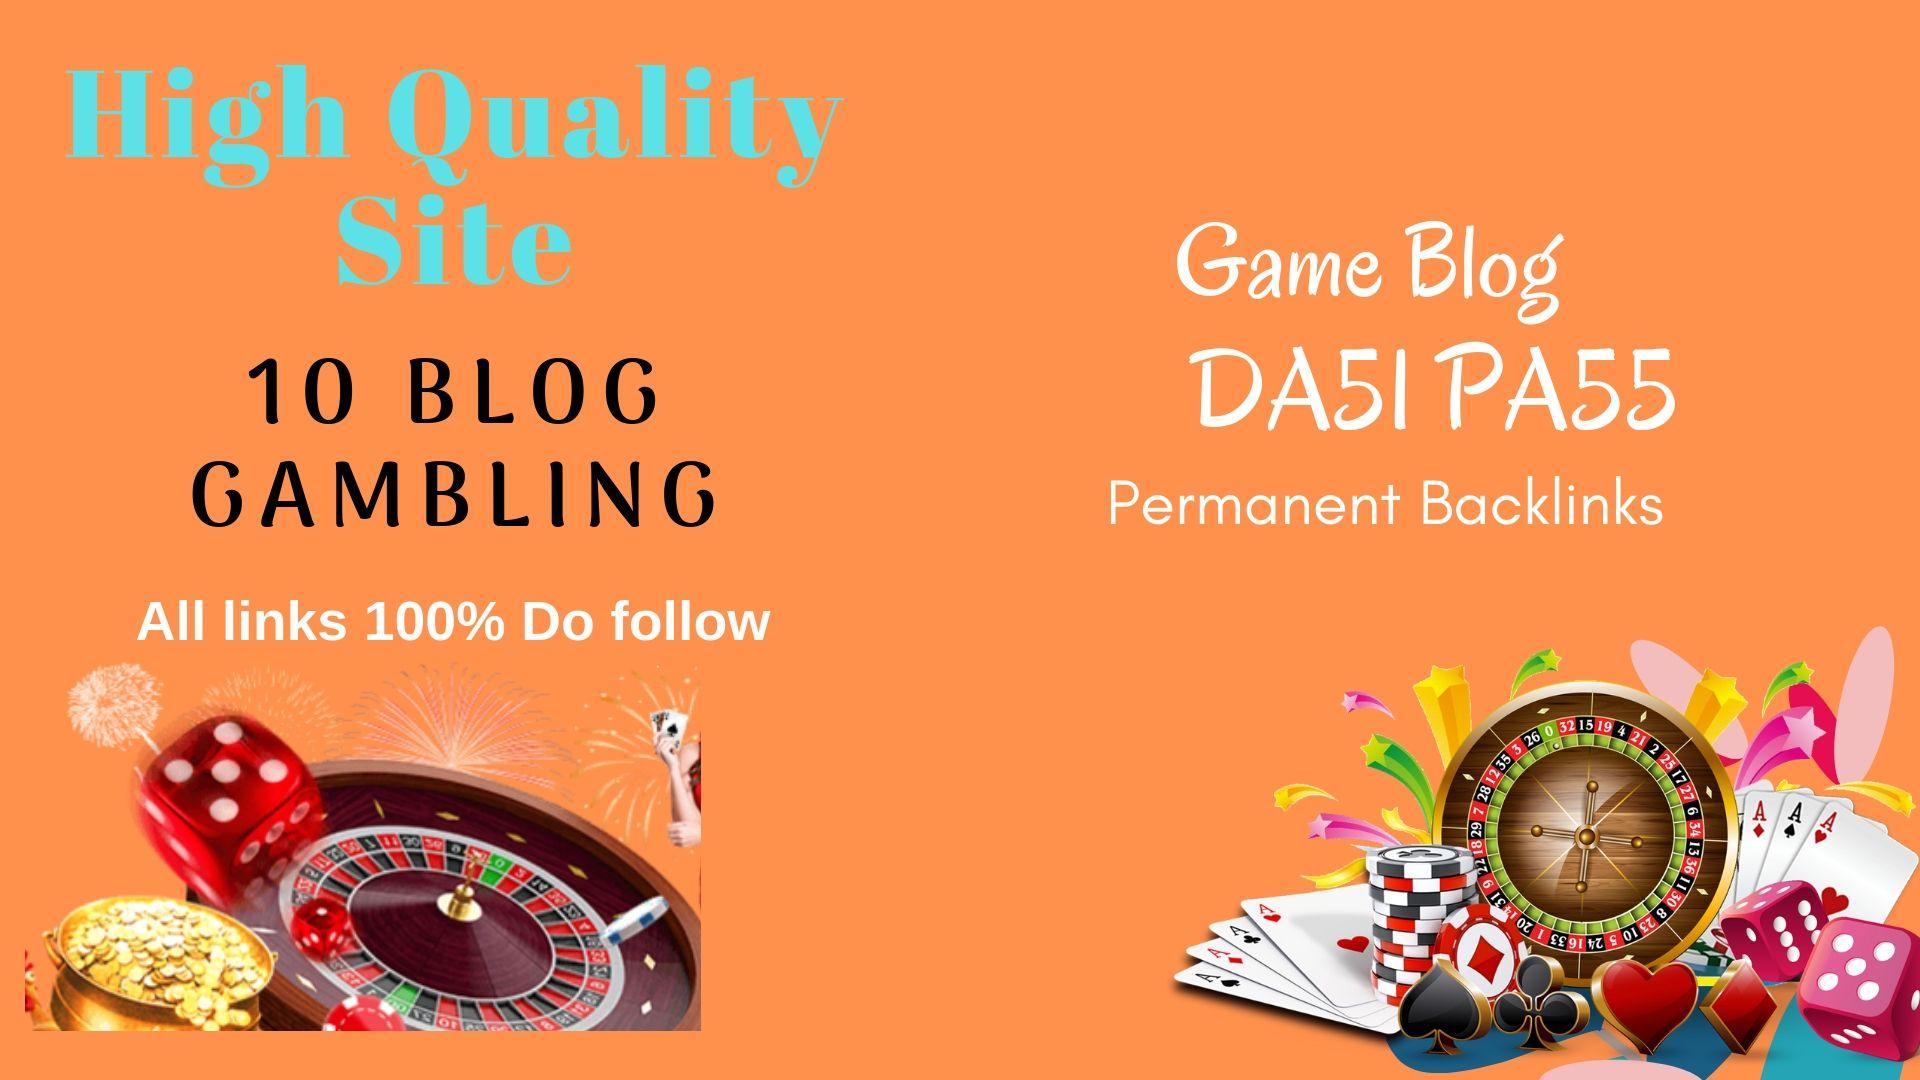 Permanent blogroll 10 Blog Casino GAmbling DA 51/ PA 55